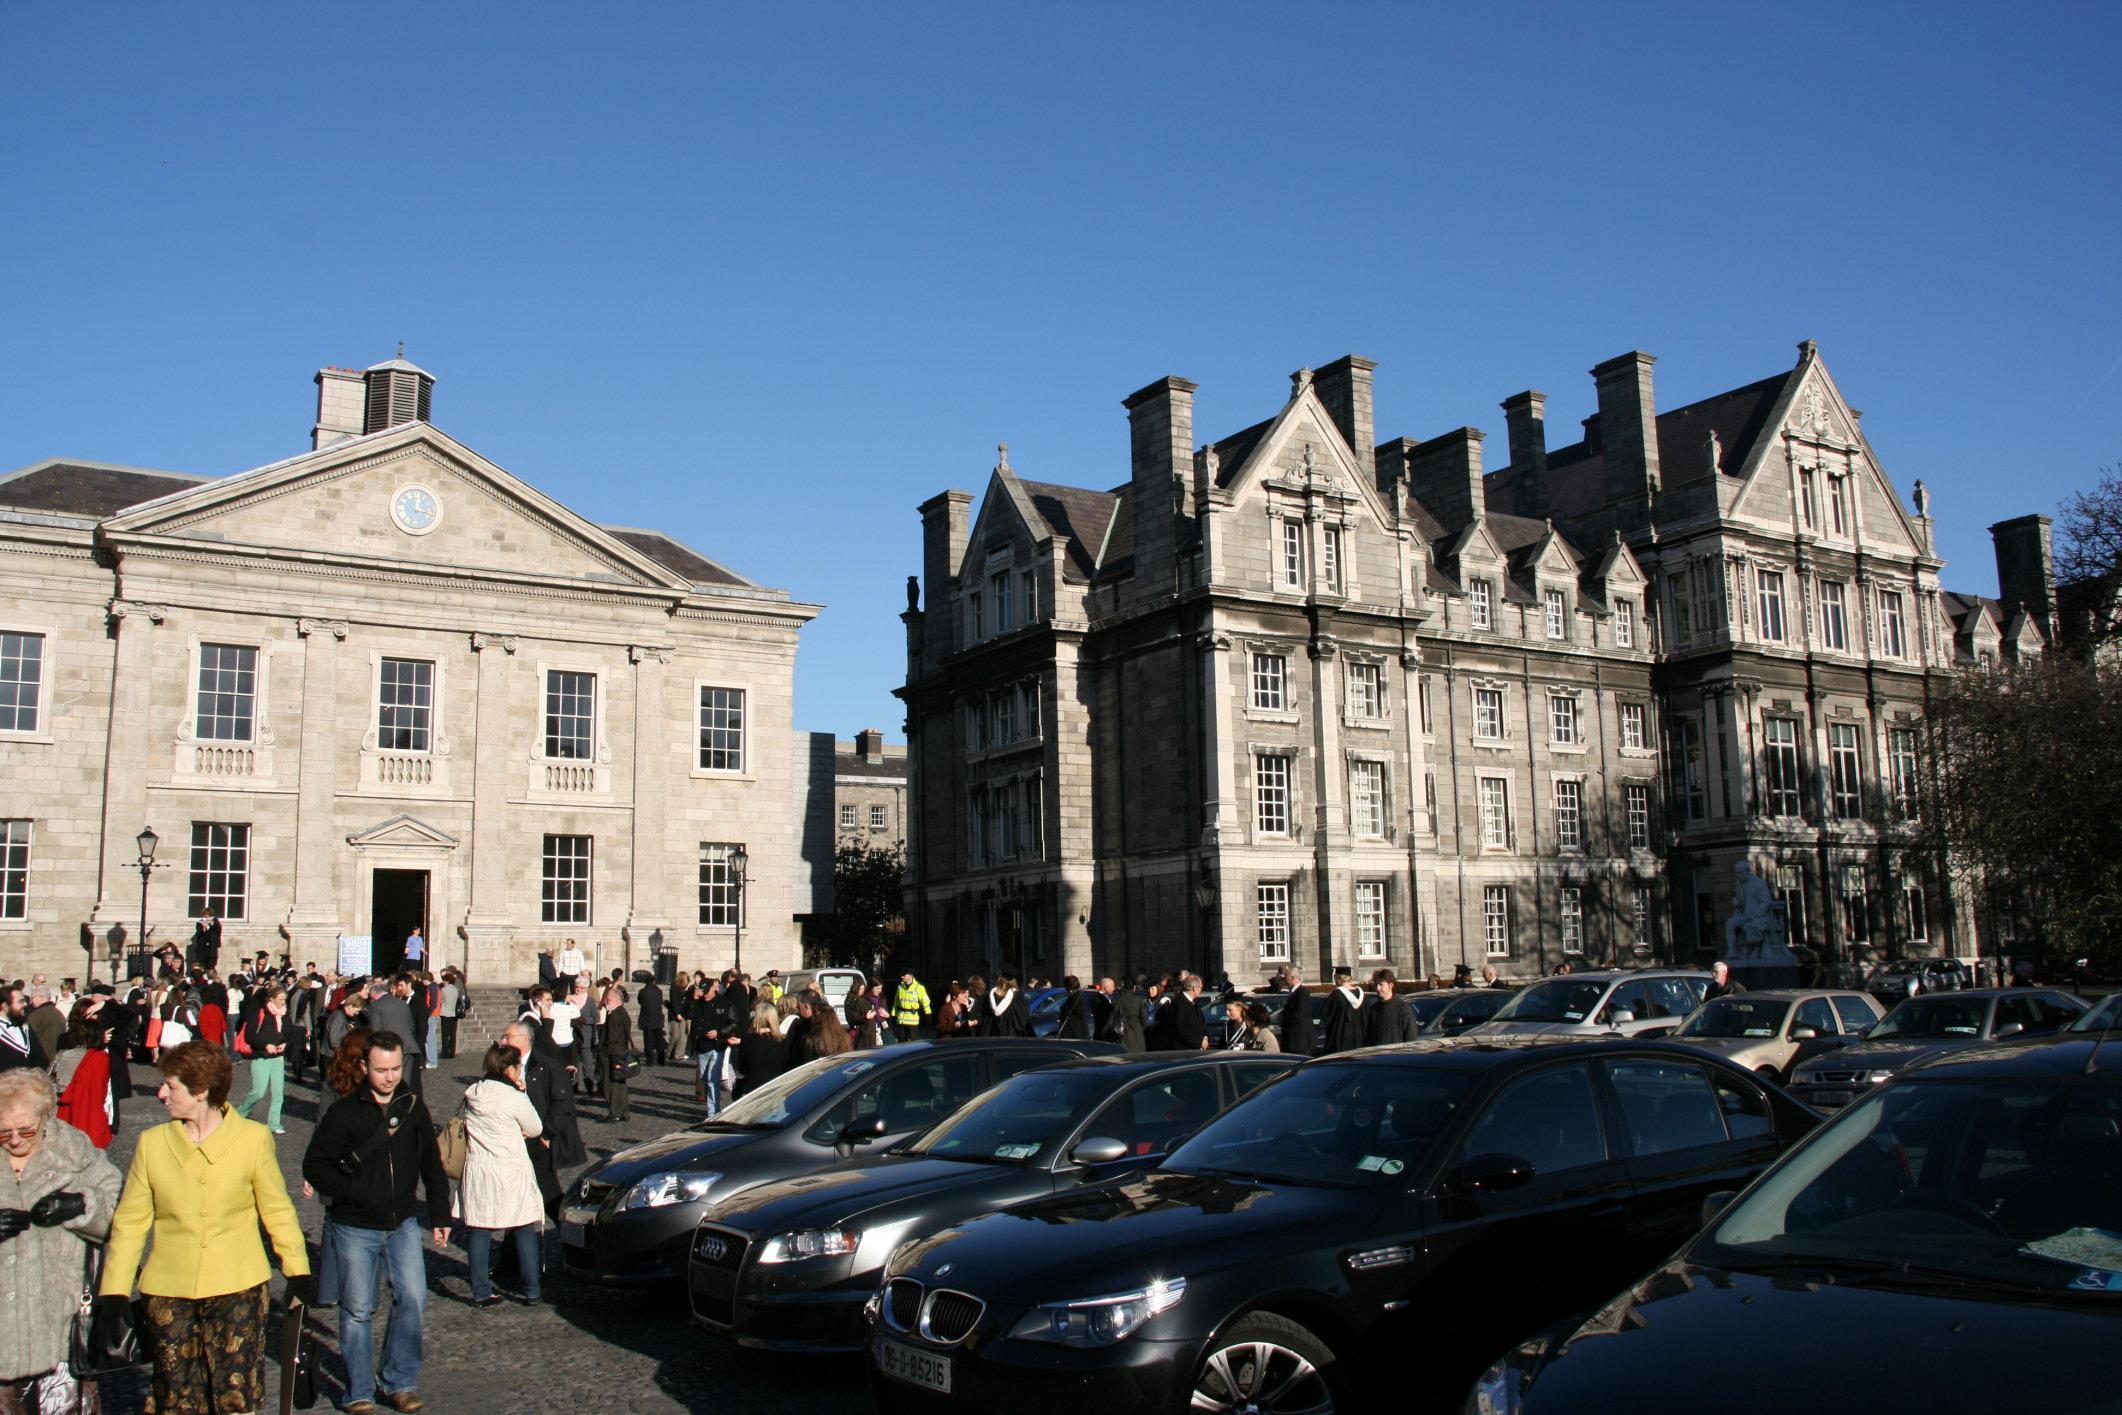 File:Trinity College, Dublin - graduation day.jpg ...